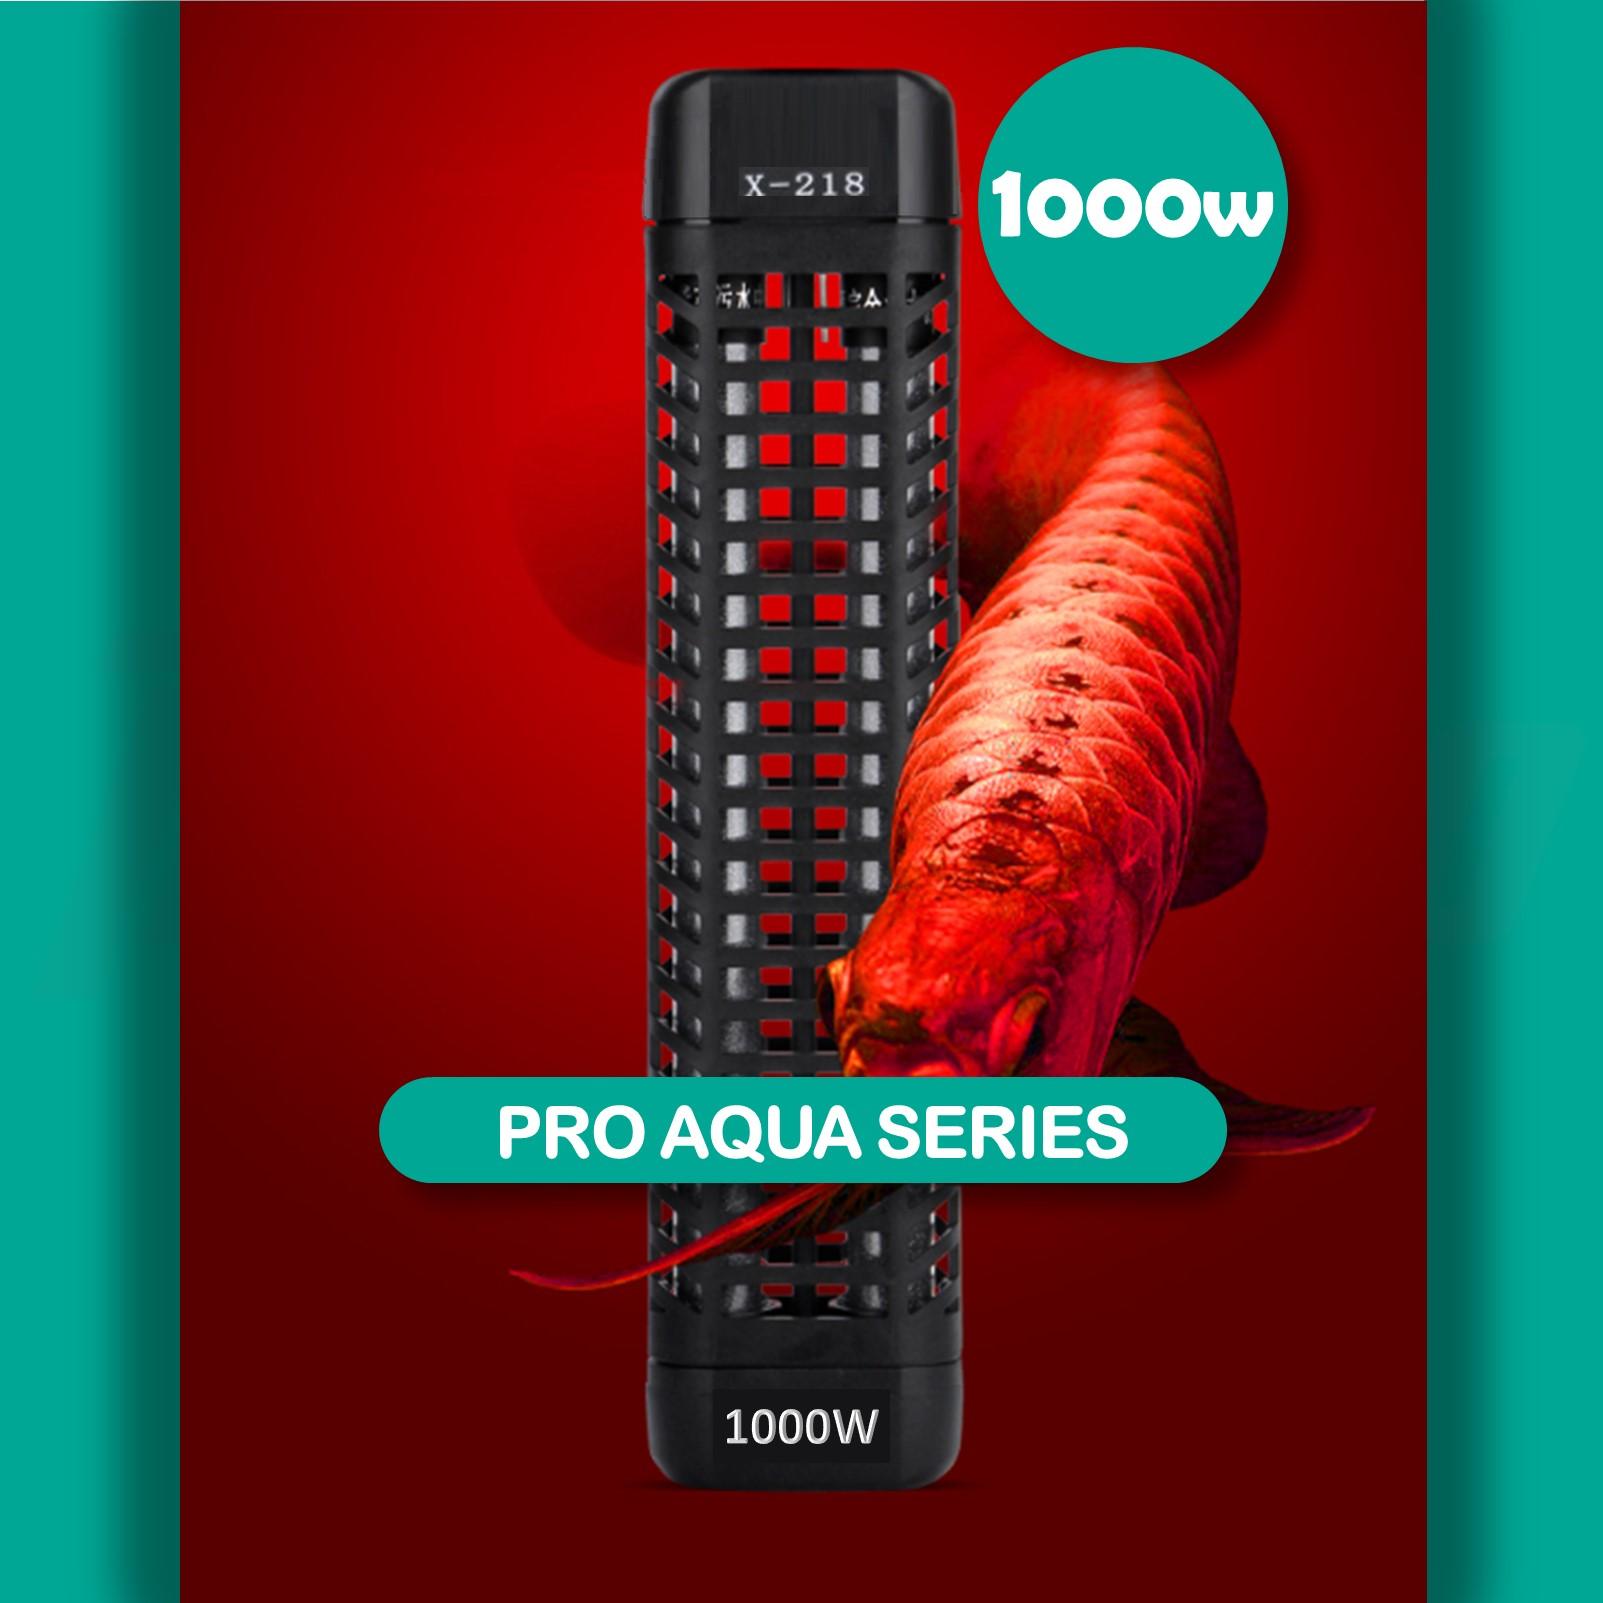 1000w Pond Heater Aquarium Water Fish Tank Adjustable Submersible Thermostat Ebay